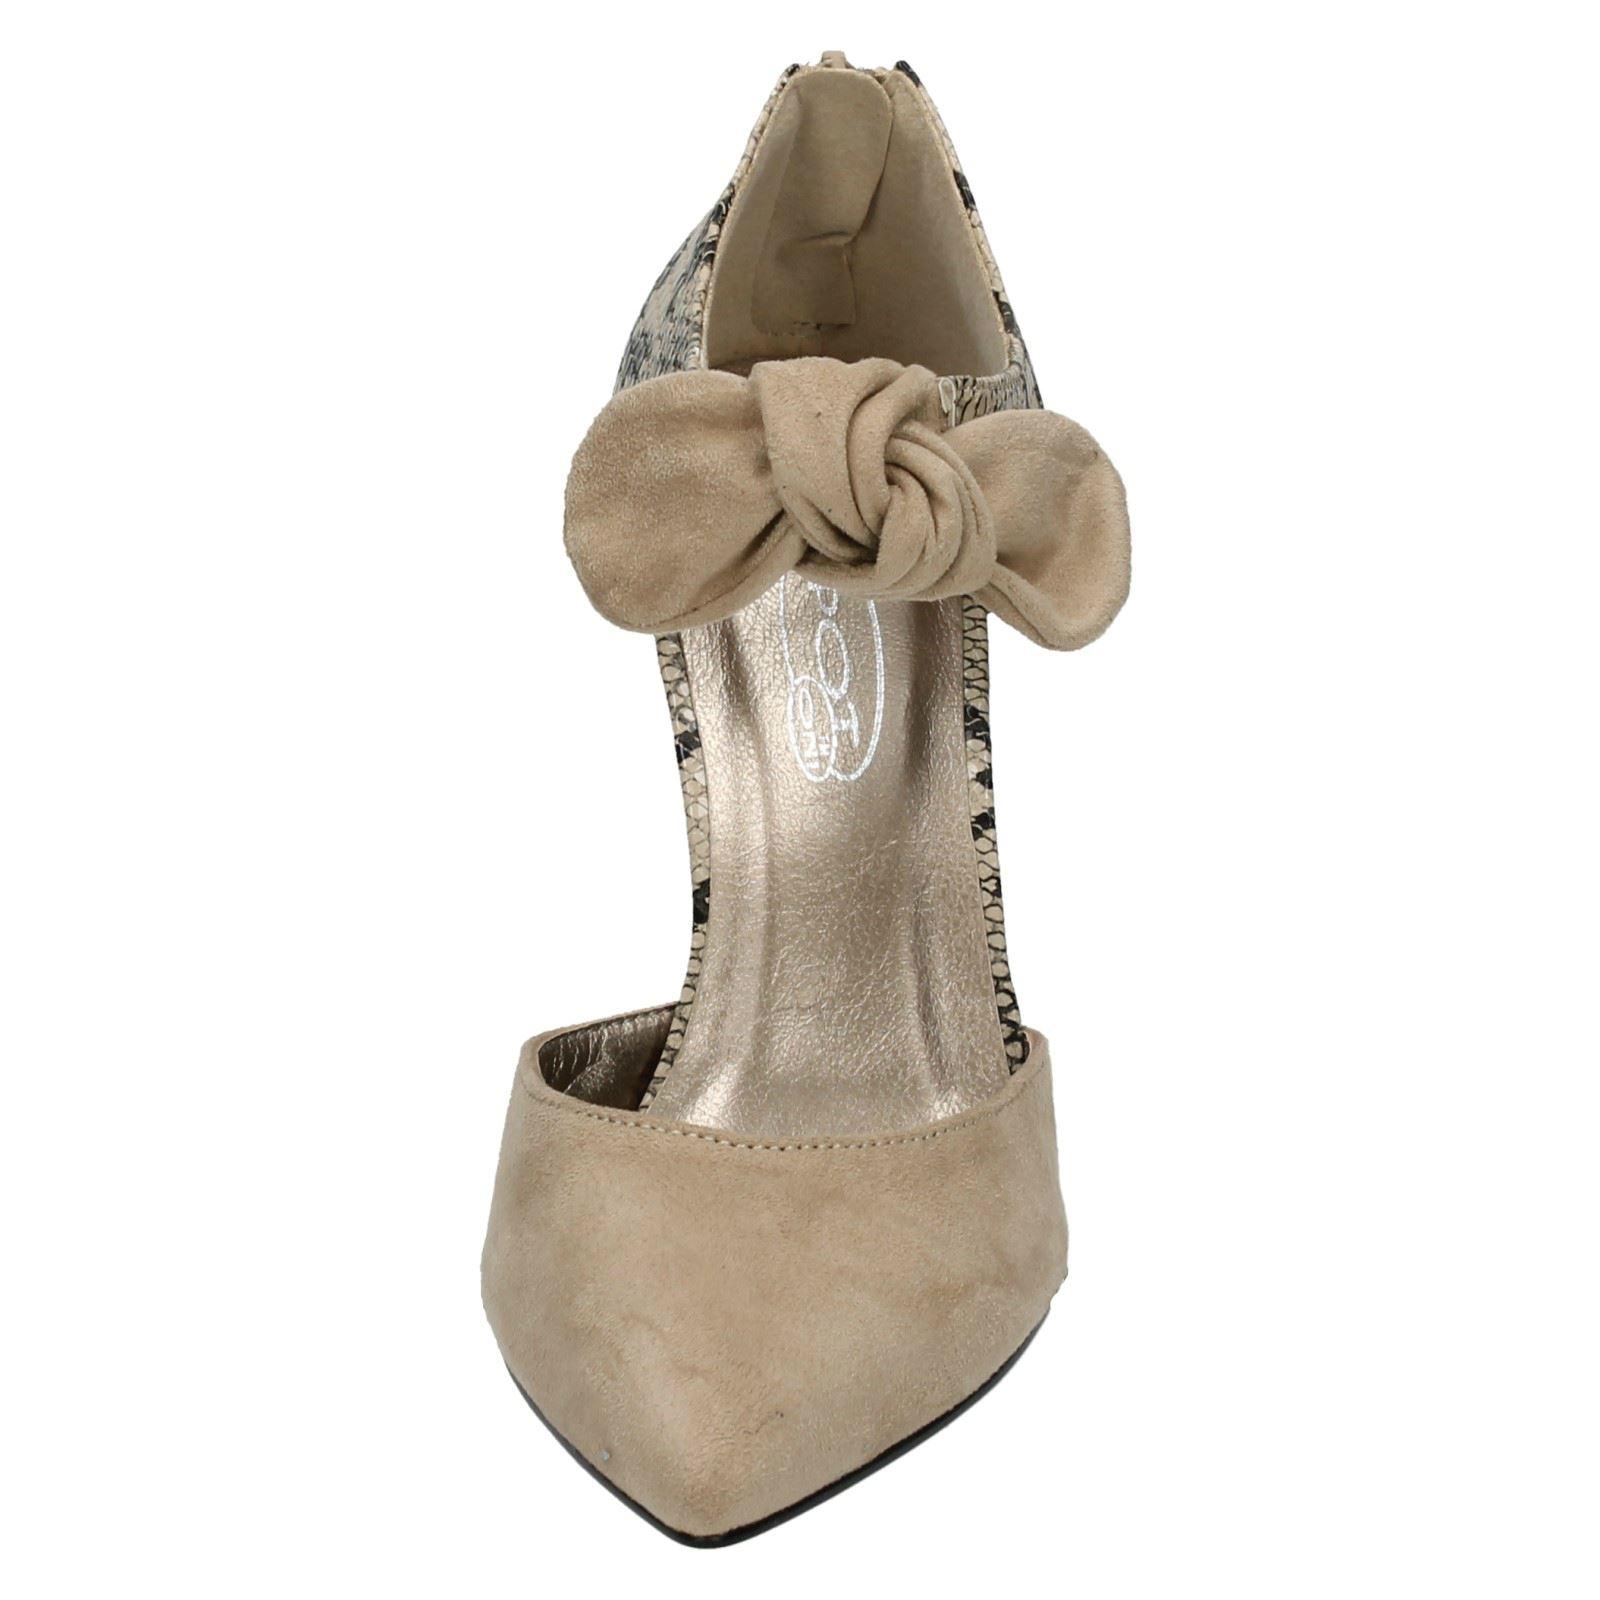 Mujeres Punto en detalle de moño Court Shoe F9746